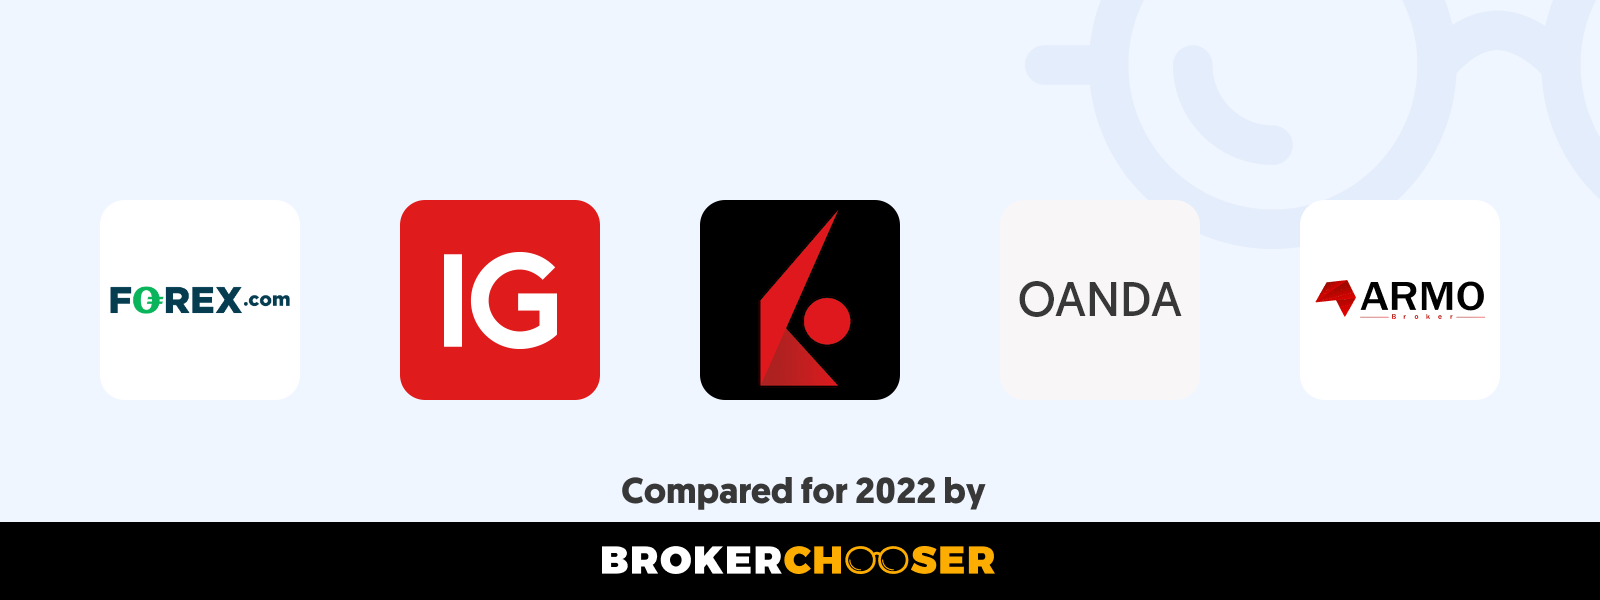 Best forex brokers for beginners in the U.S. Virgin Islands in 2021